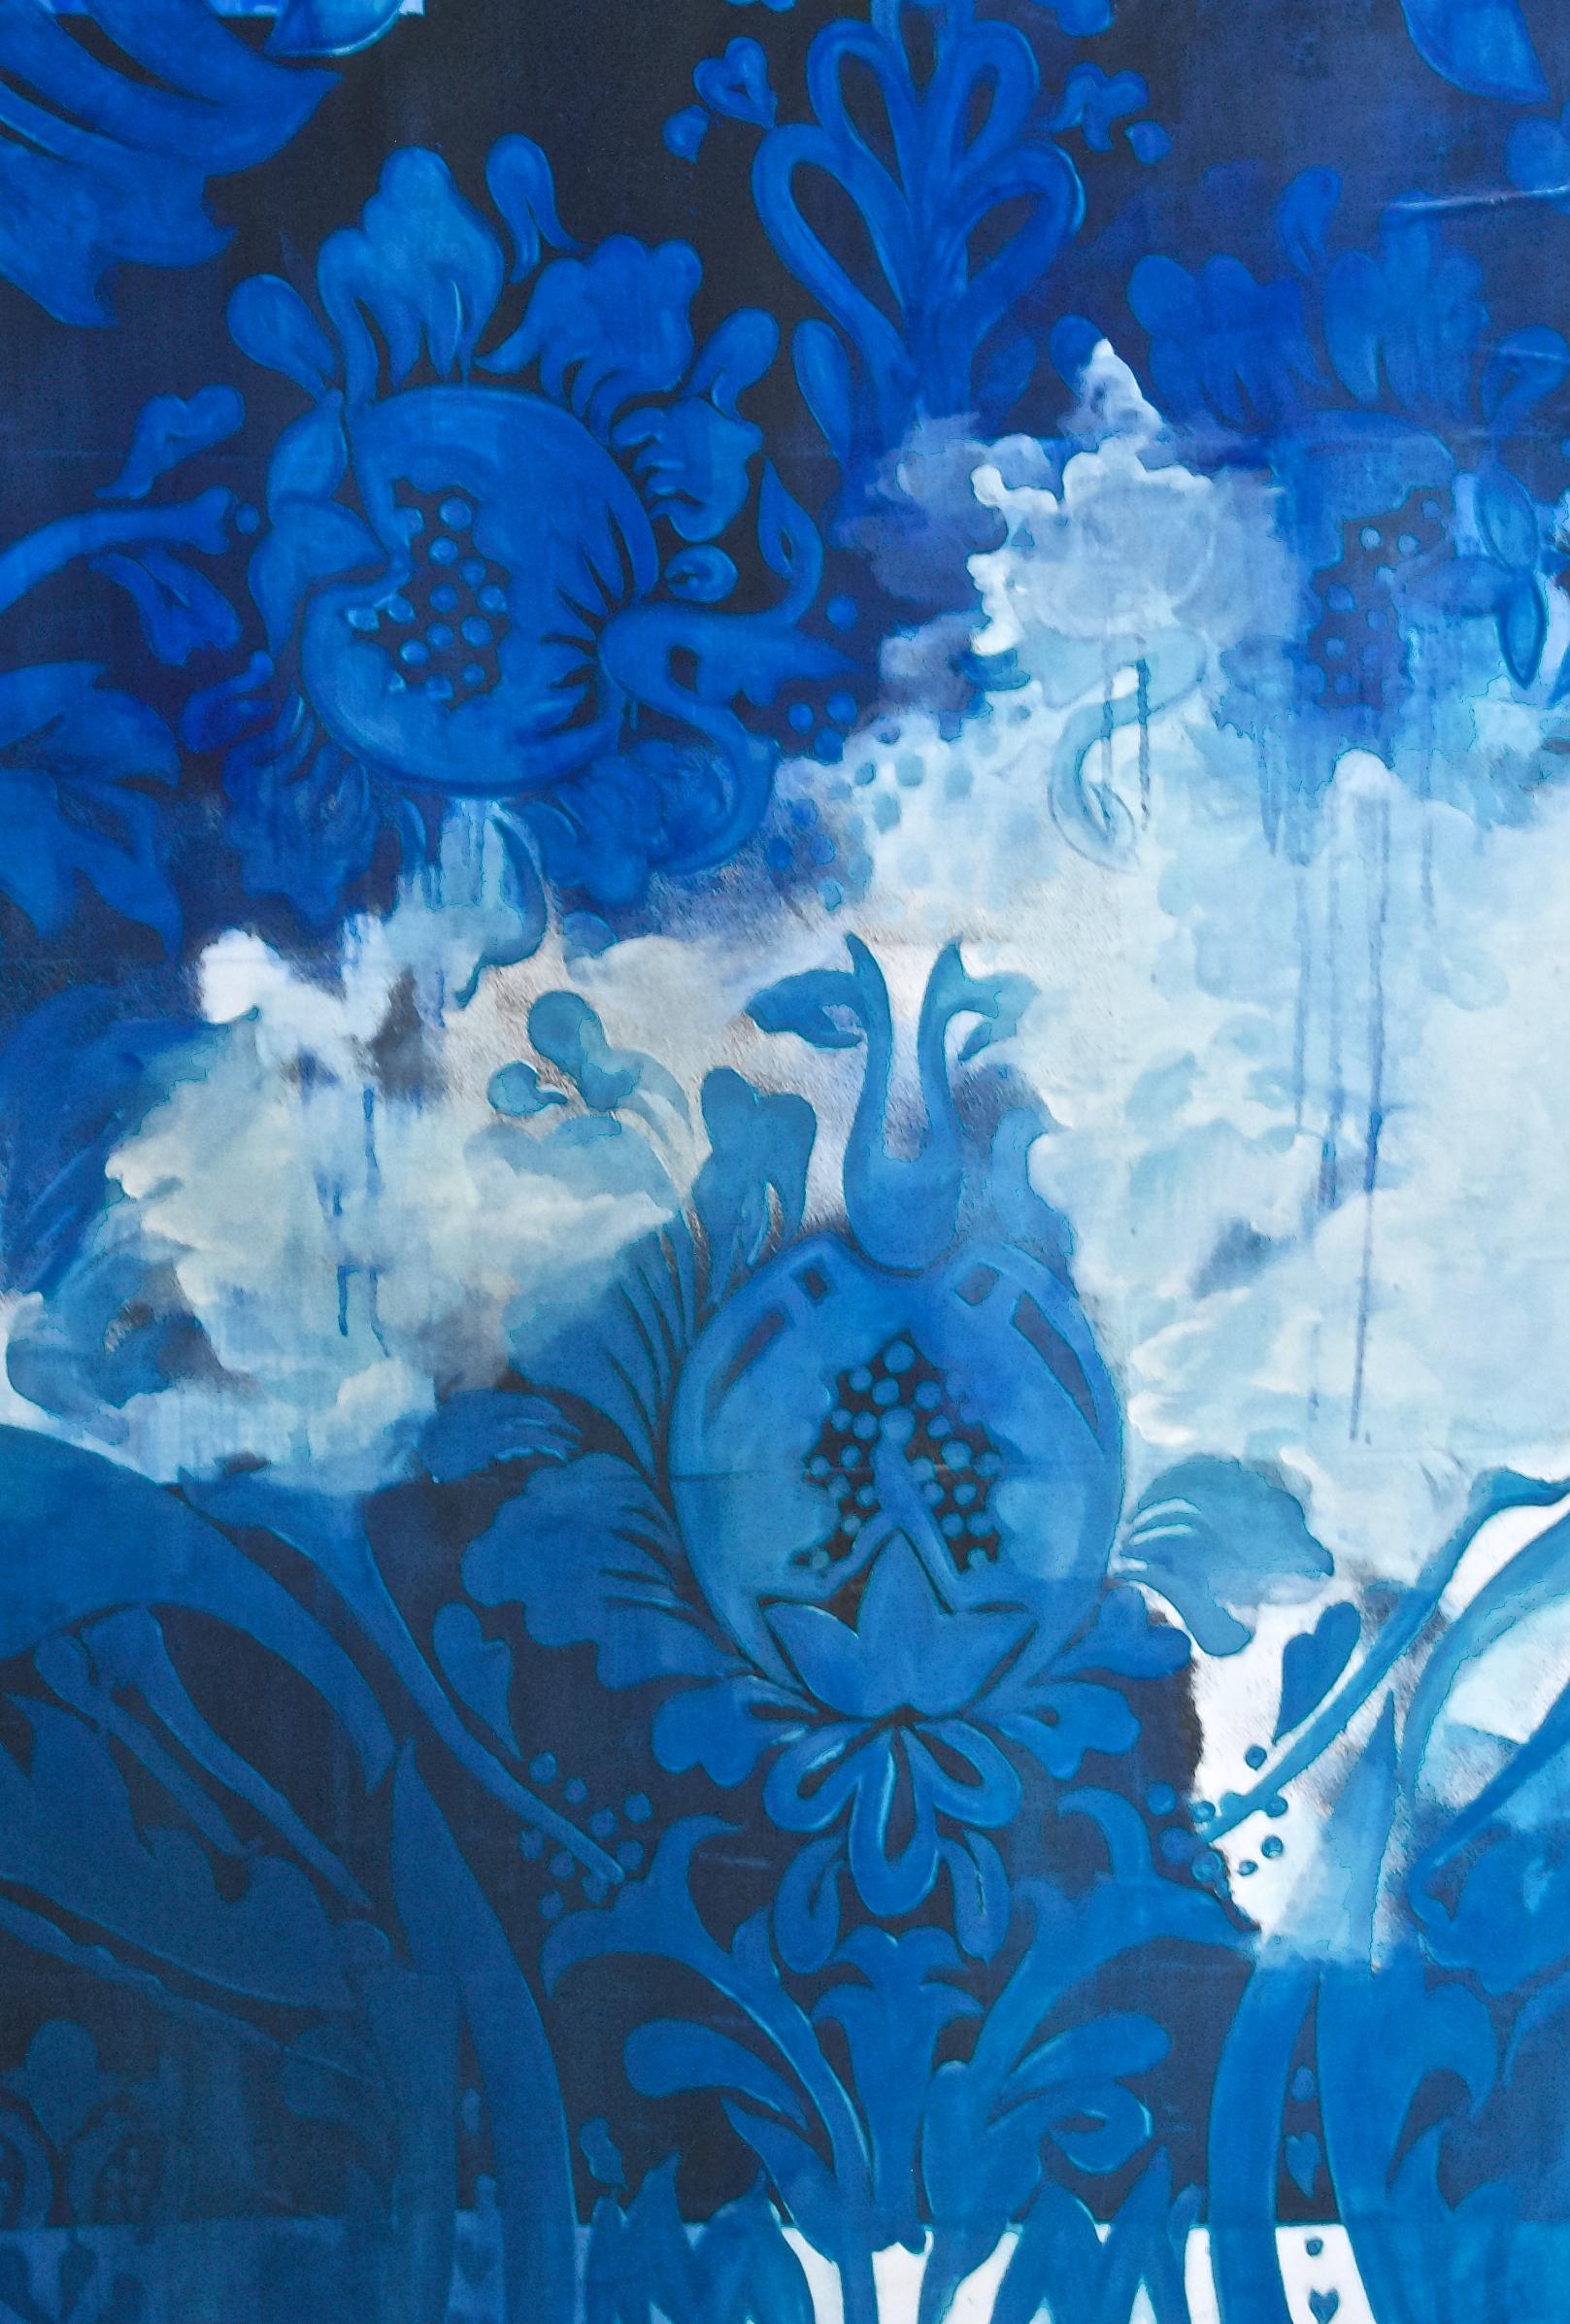 Blue Print of a Summer Storm